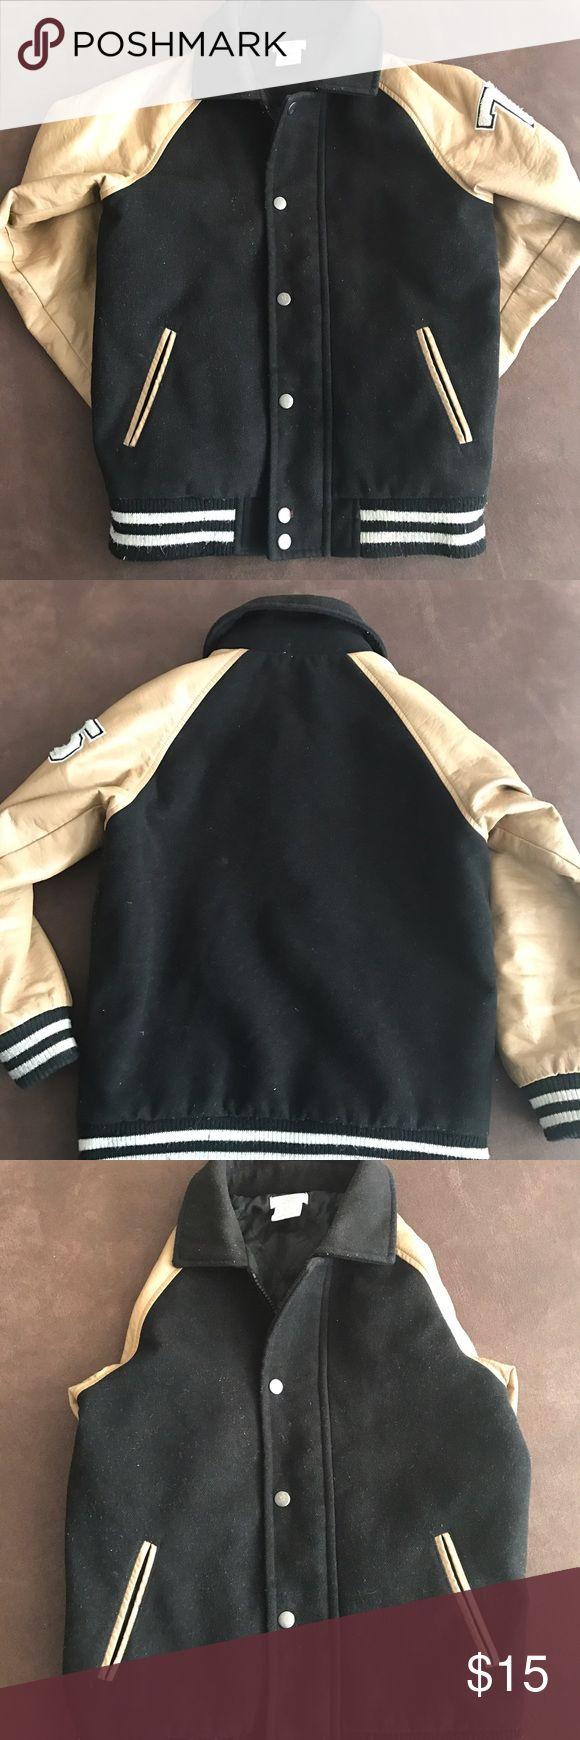 Varsity letterman jacket Kids letterman jacket. My son love this jacket. Has gotten to small for him. Joe  Jackets & Coats